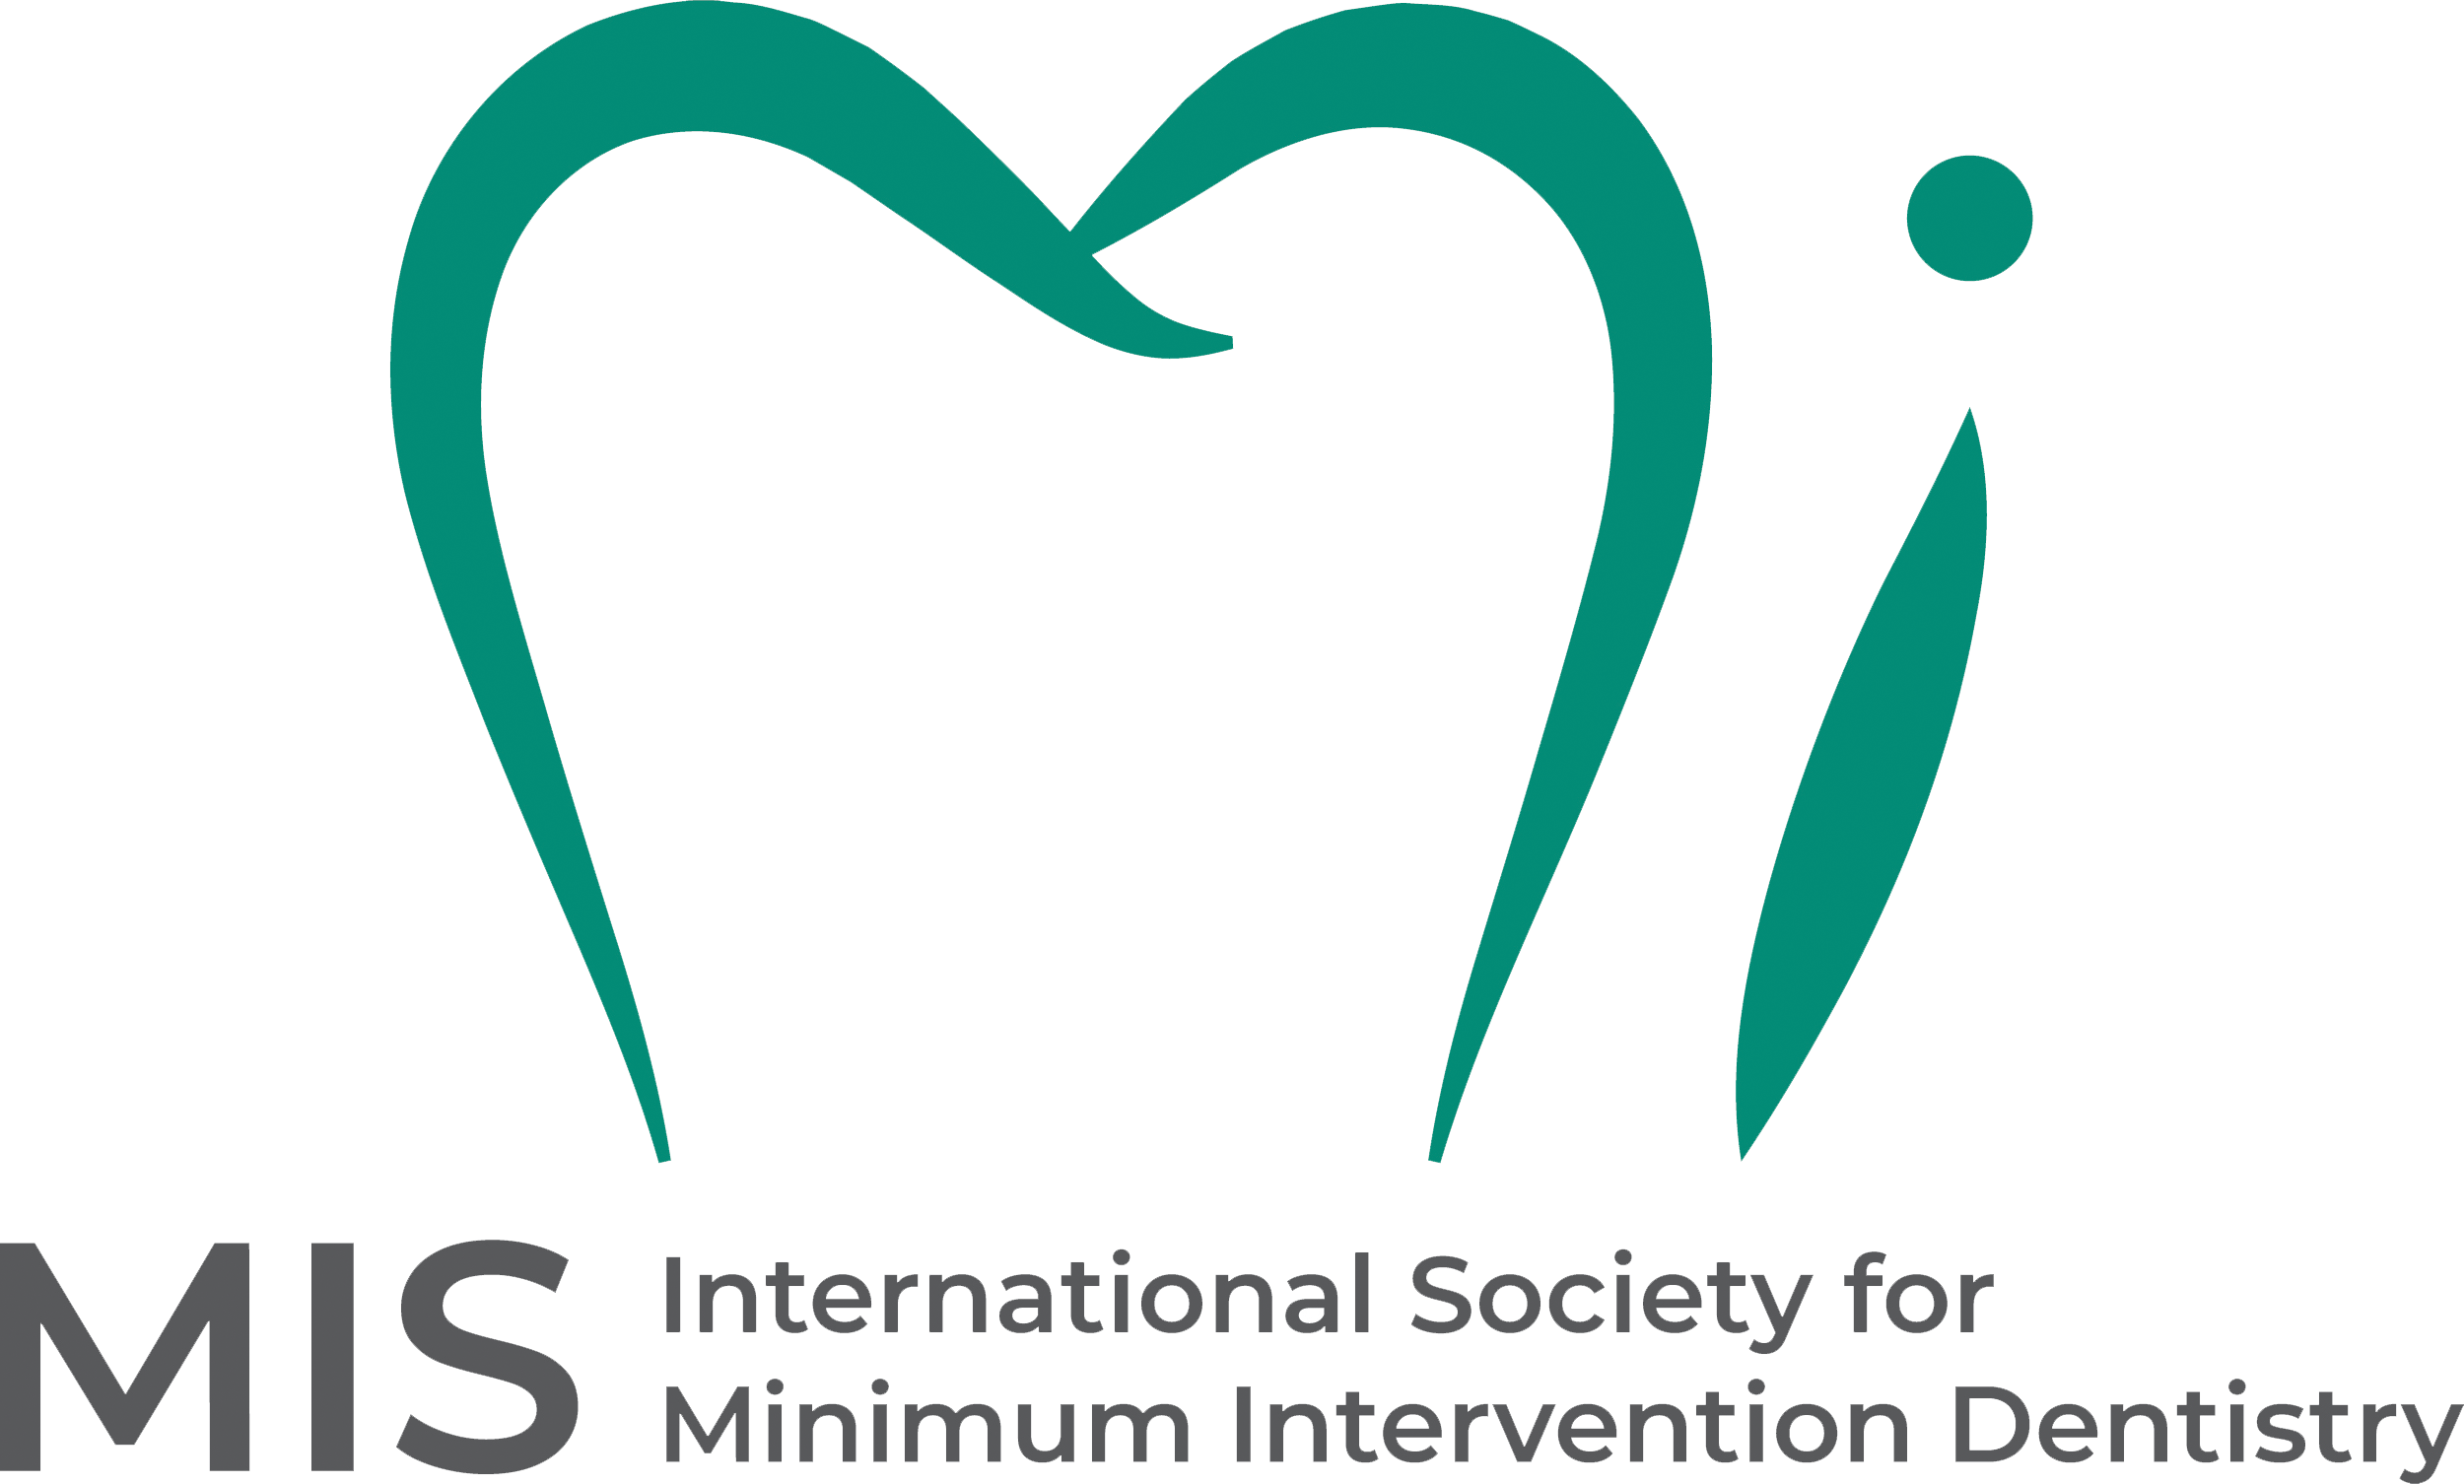 International Society for Minimum MIS